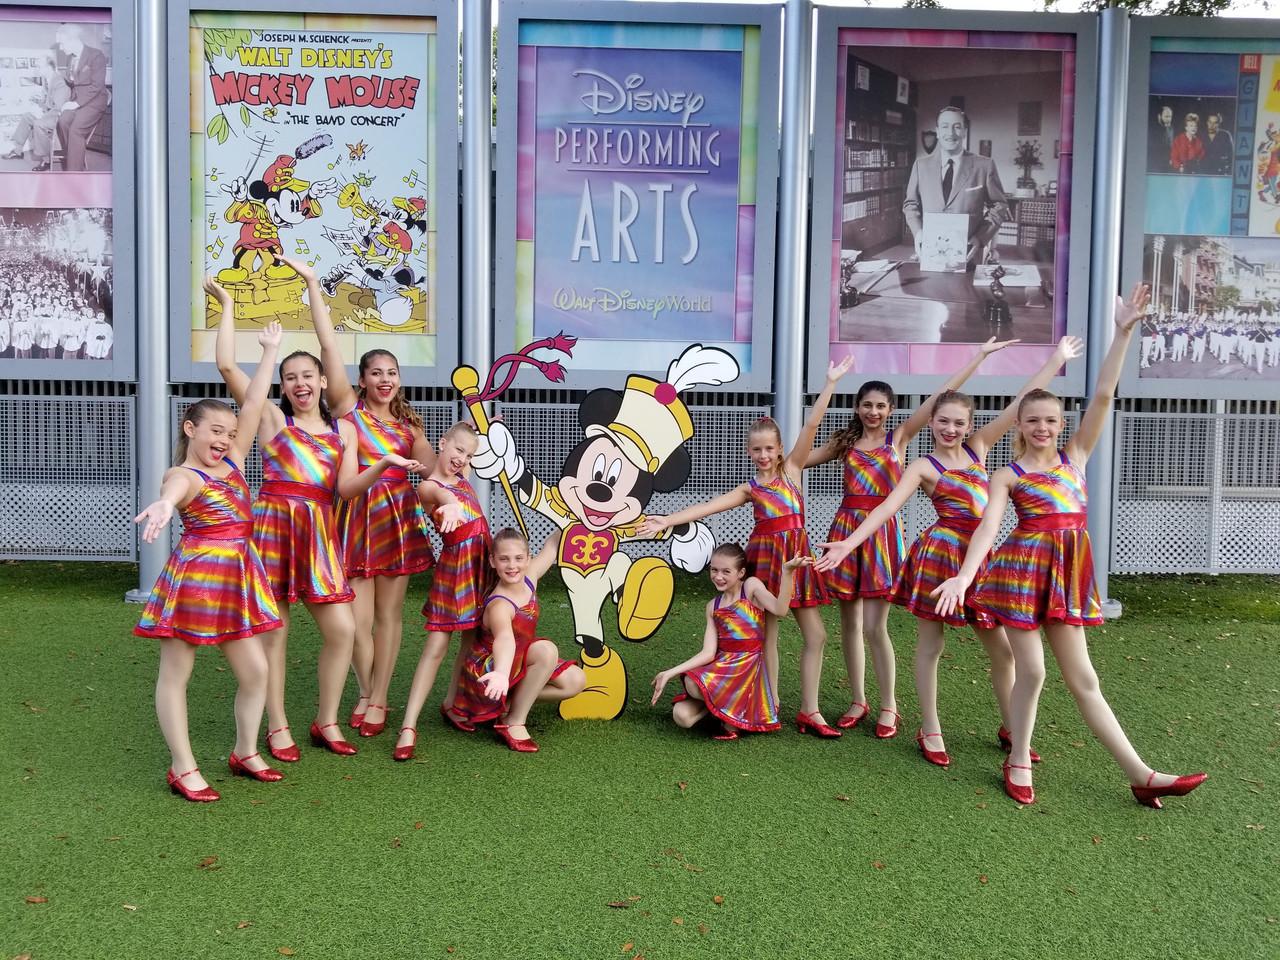 2017 Disneyland Image.jpg